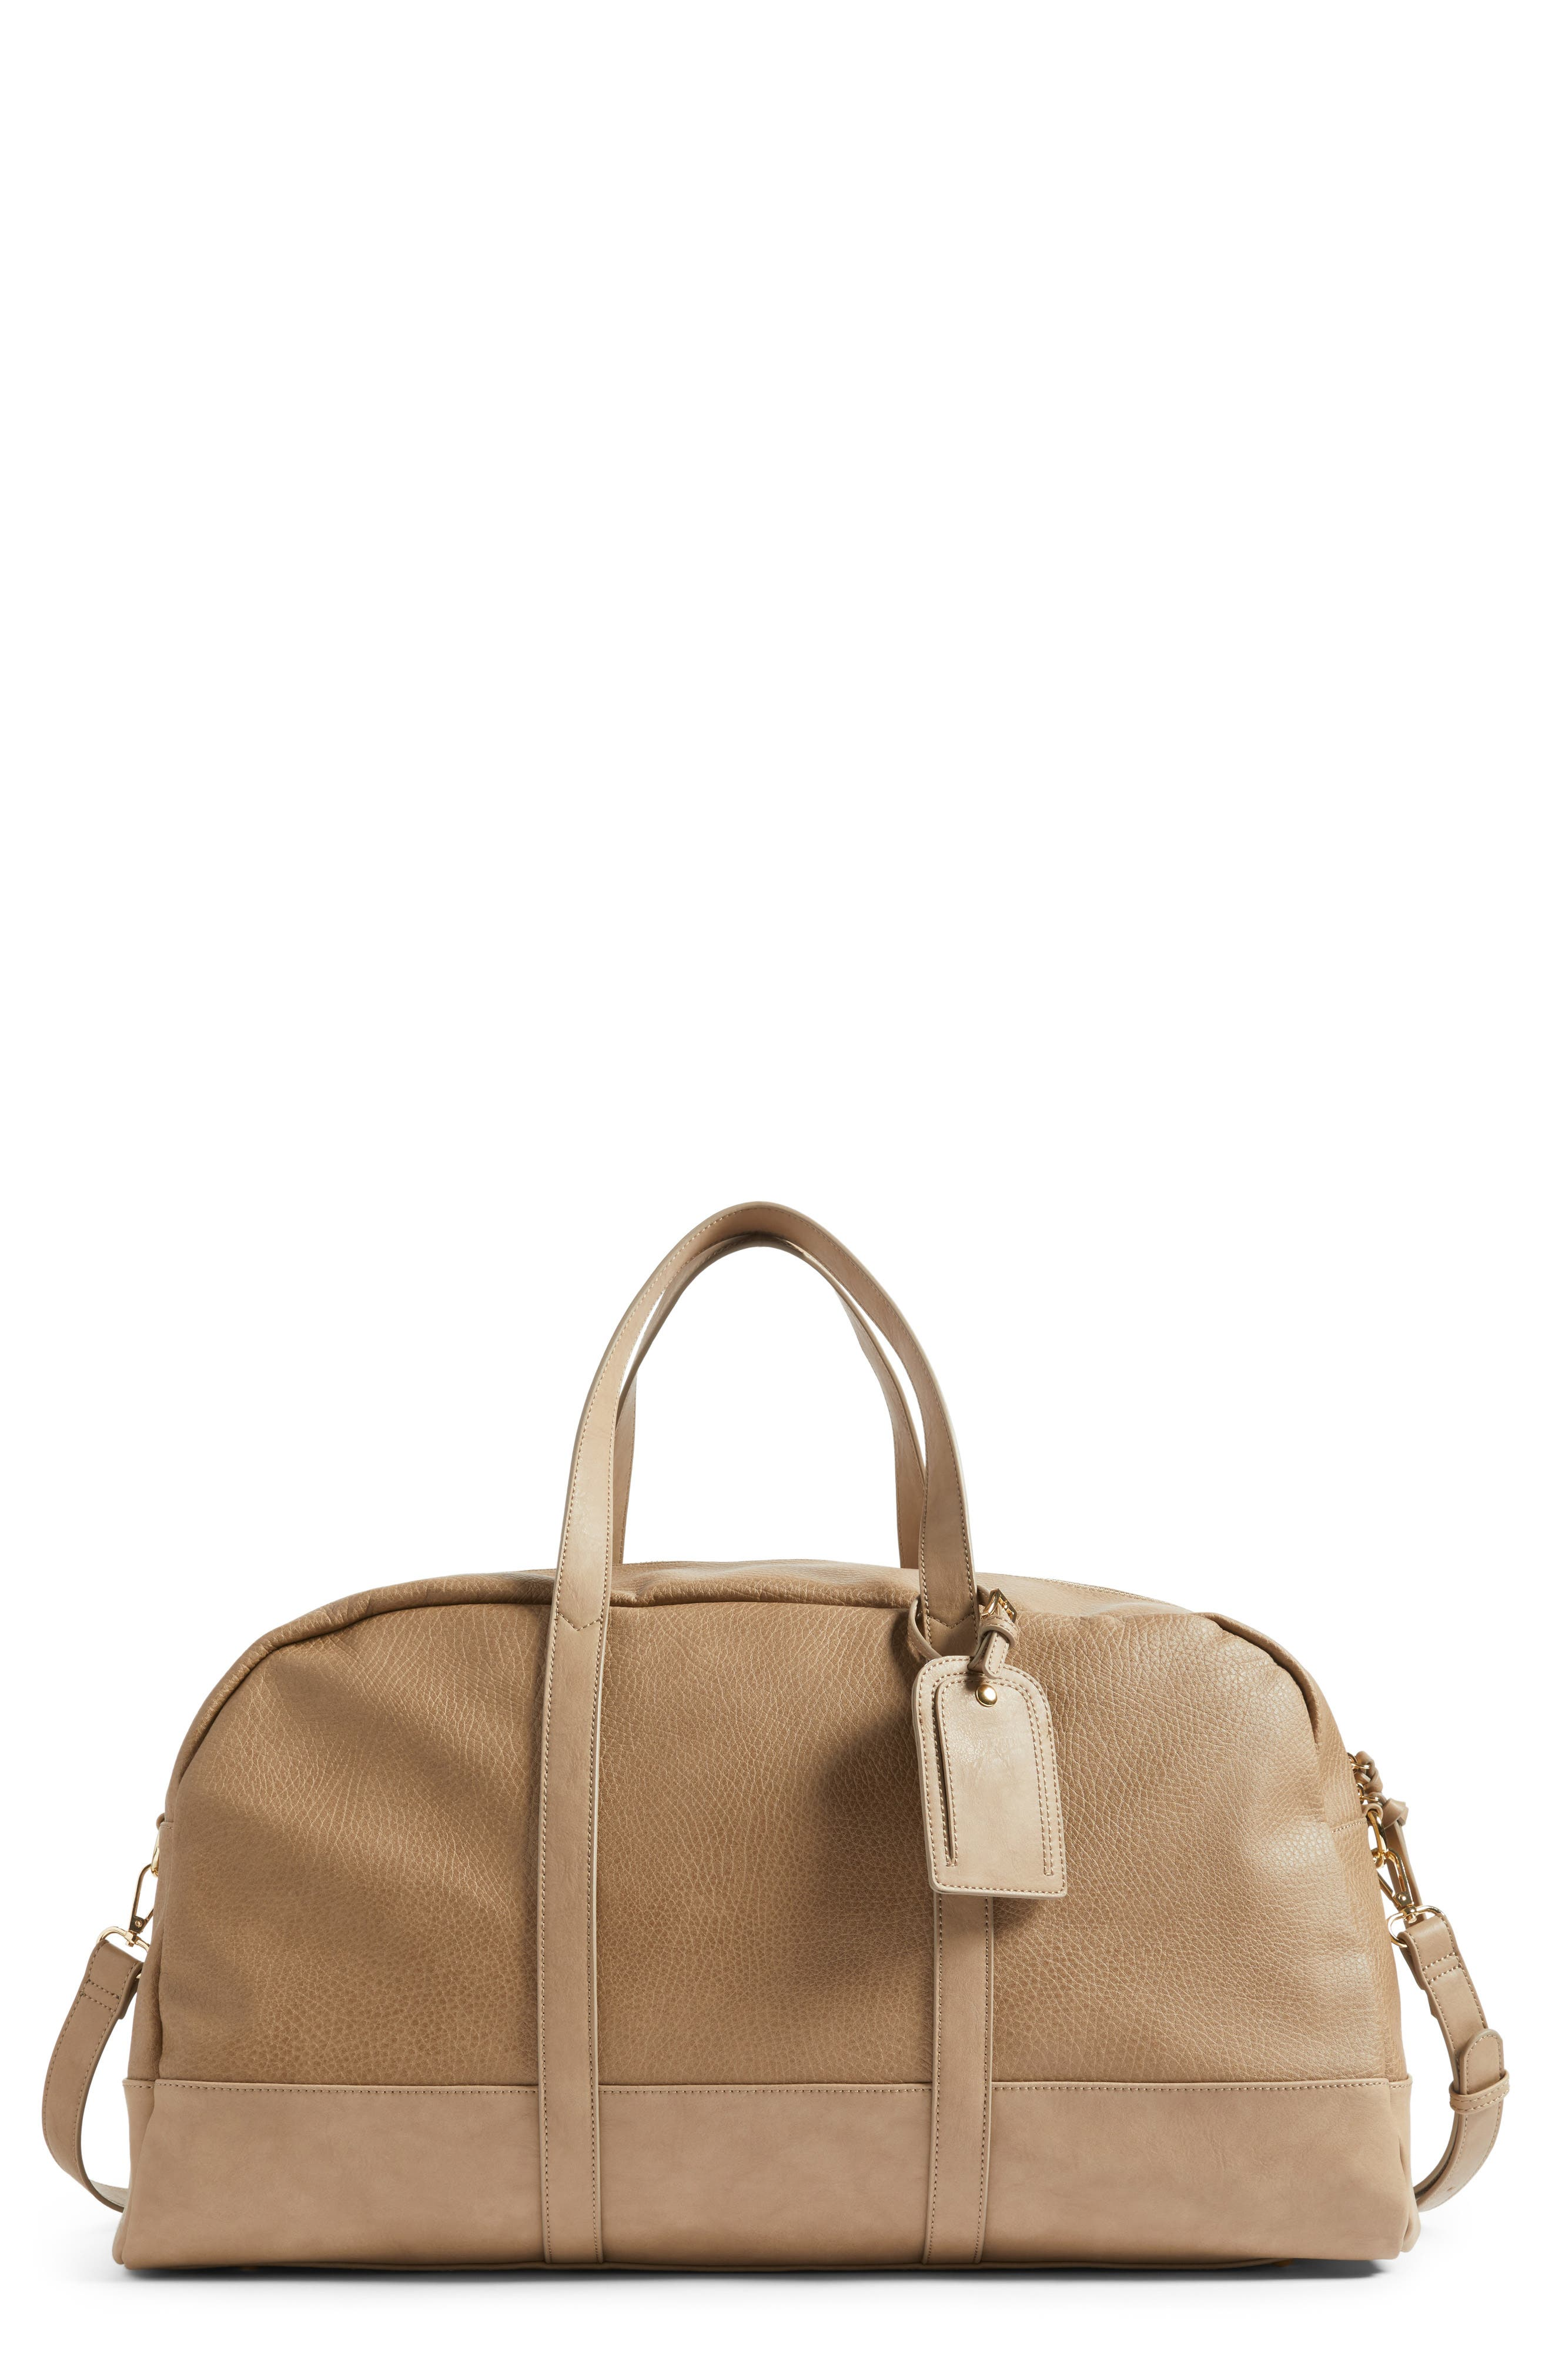 Sole Society Marant Faux Leather Duffle Bag